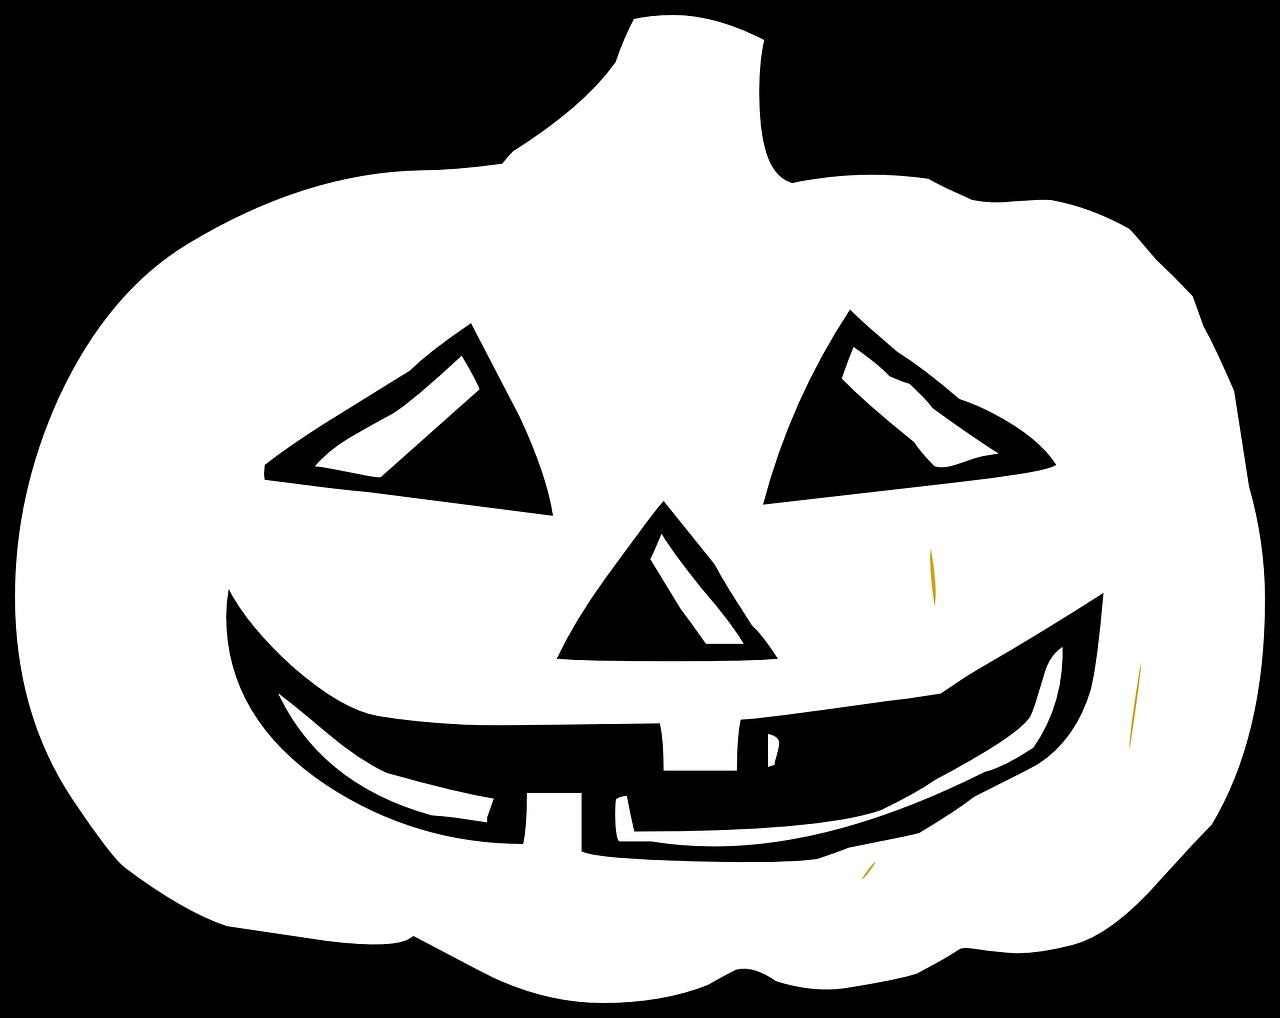 Картинки на хэллоуин черно белые, картинки узбек чего